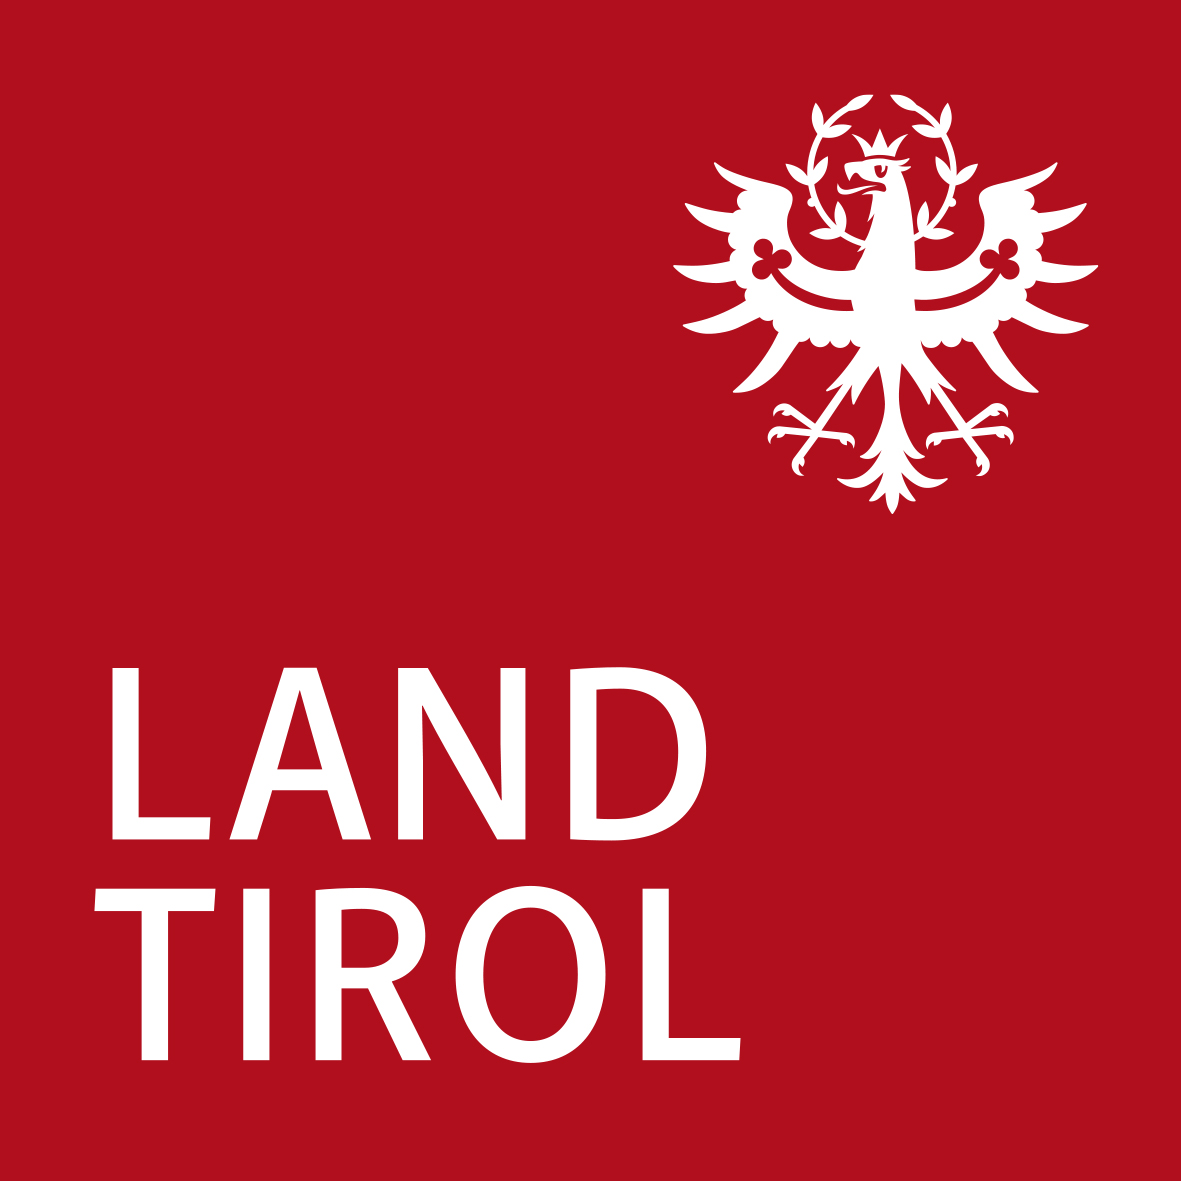 Das Logo des Landes Tirol